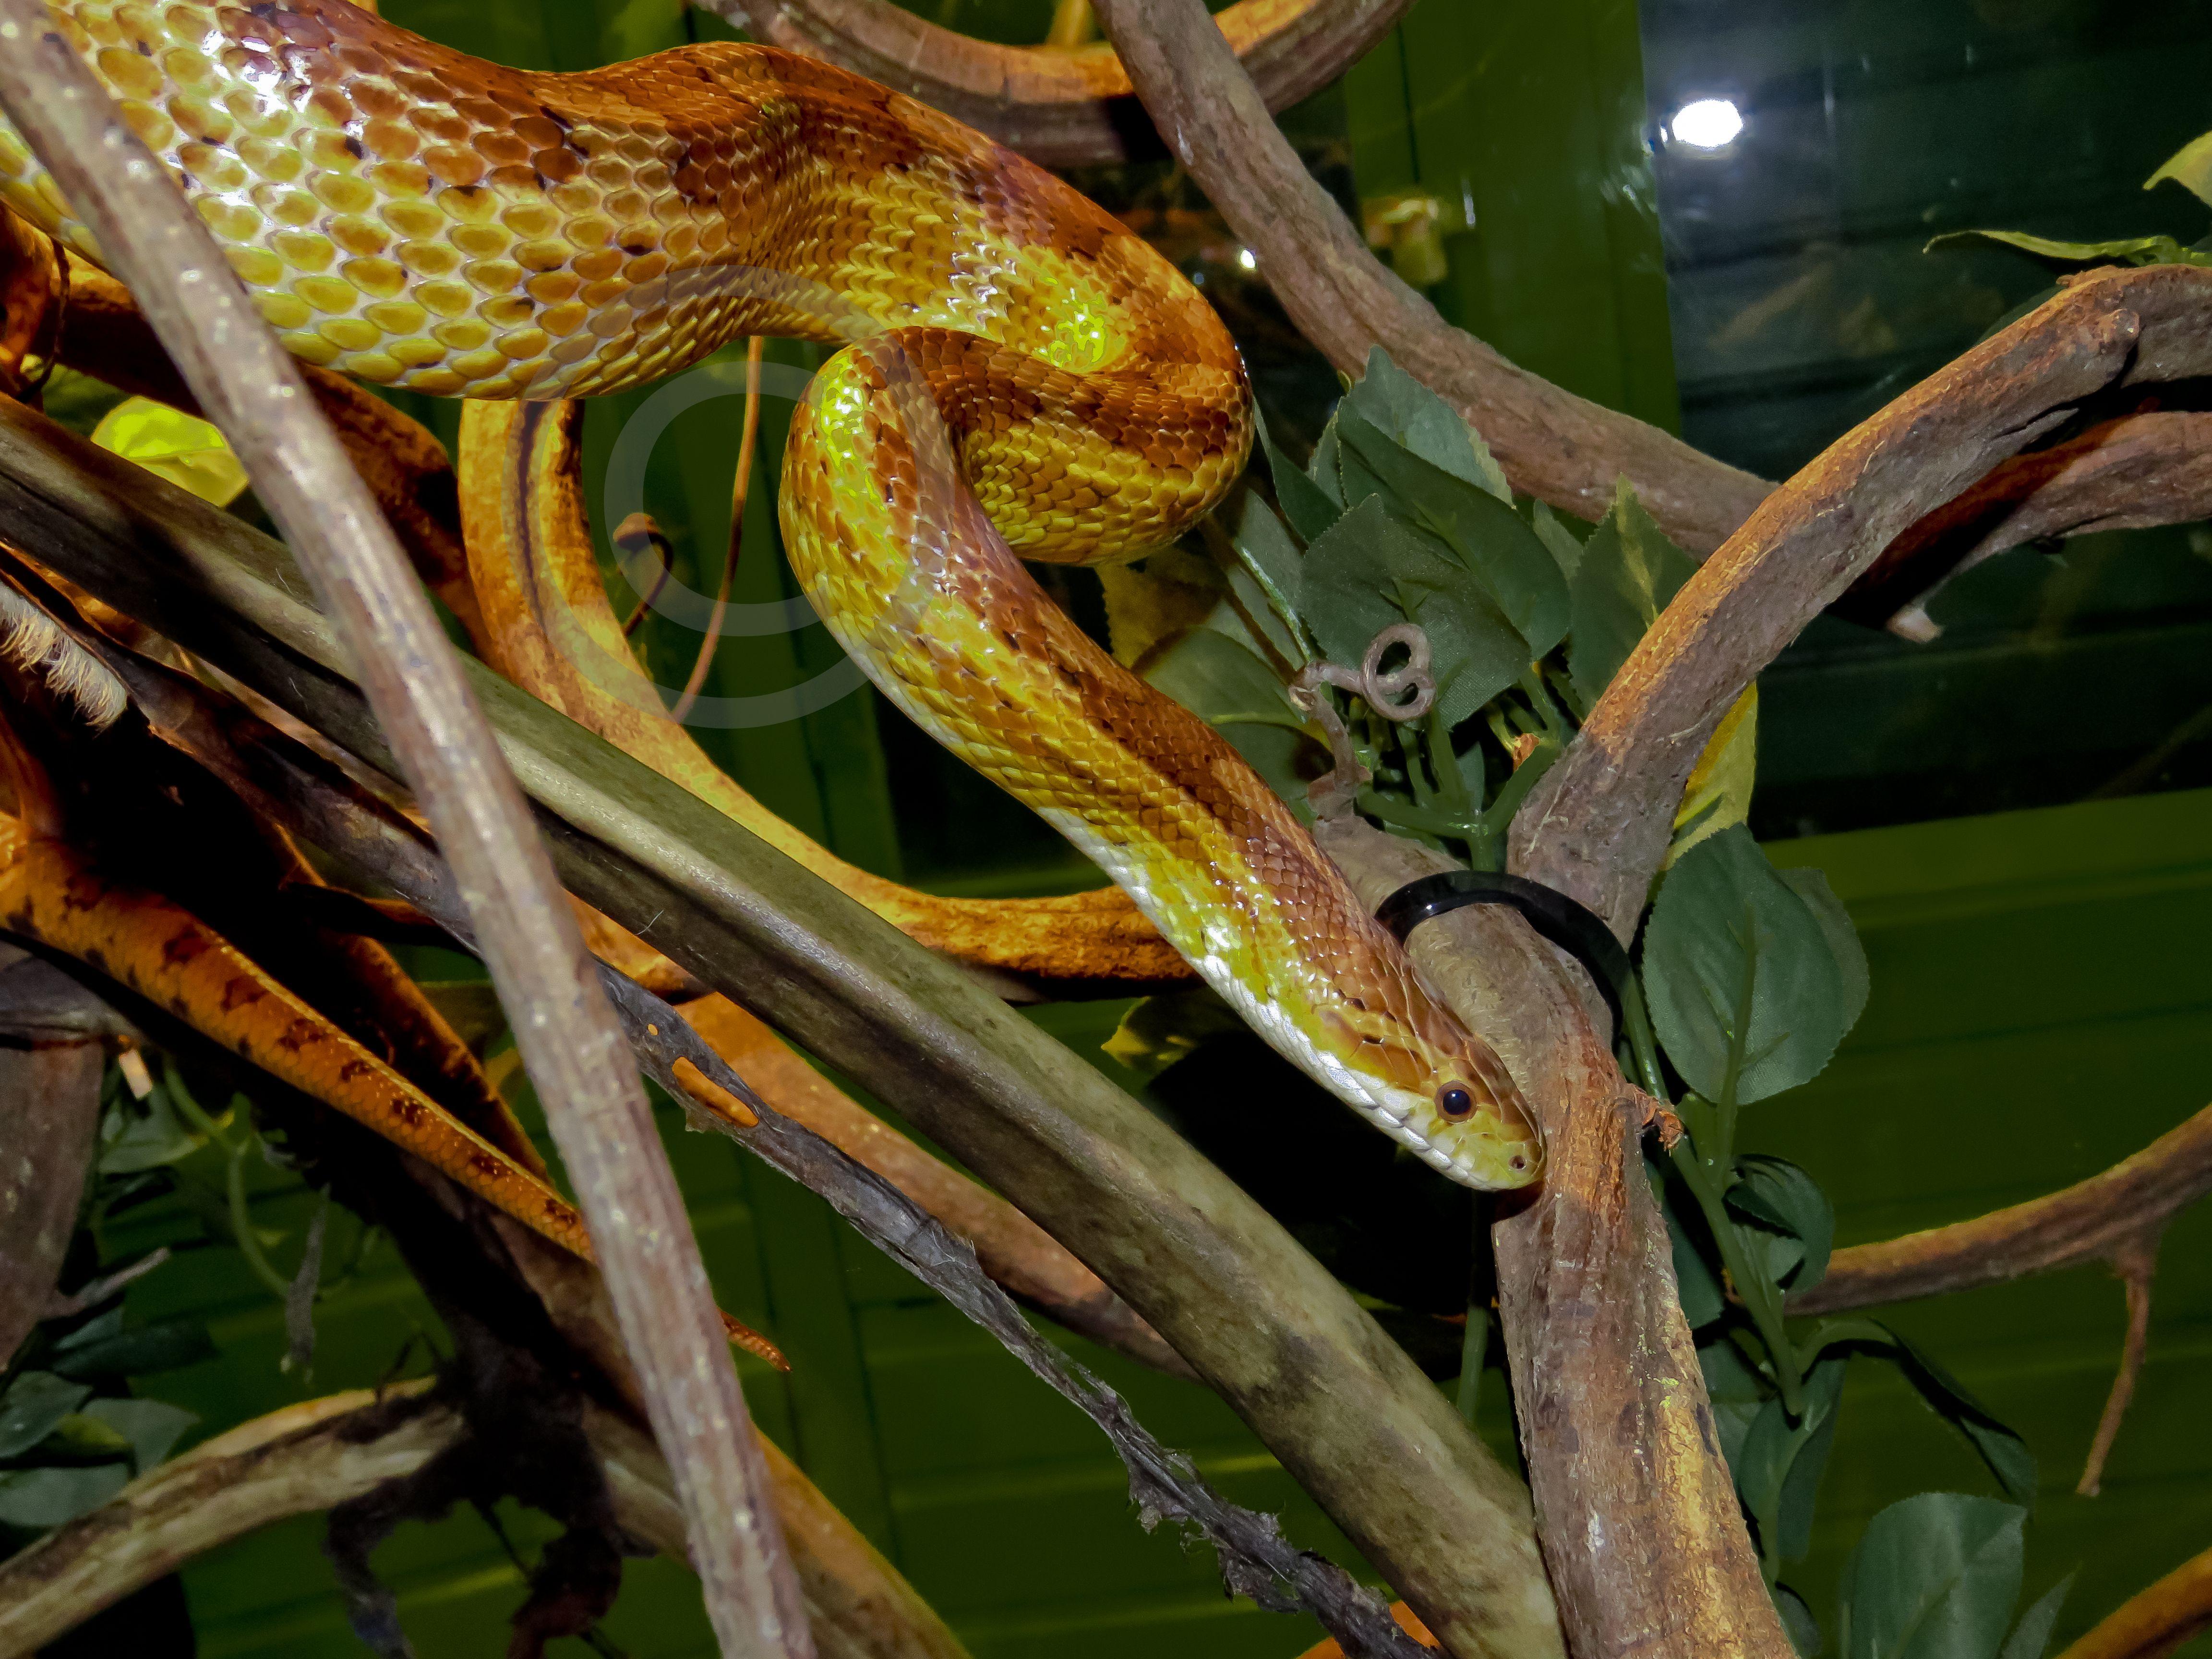 Corn Snake Corn snake, Pets, Natural world